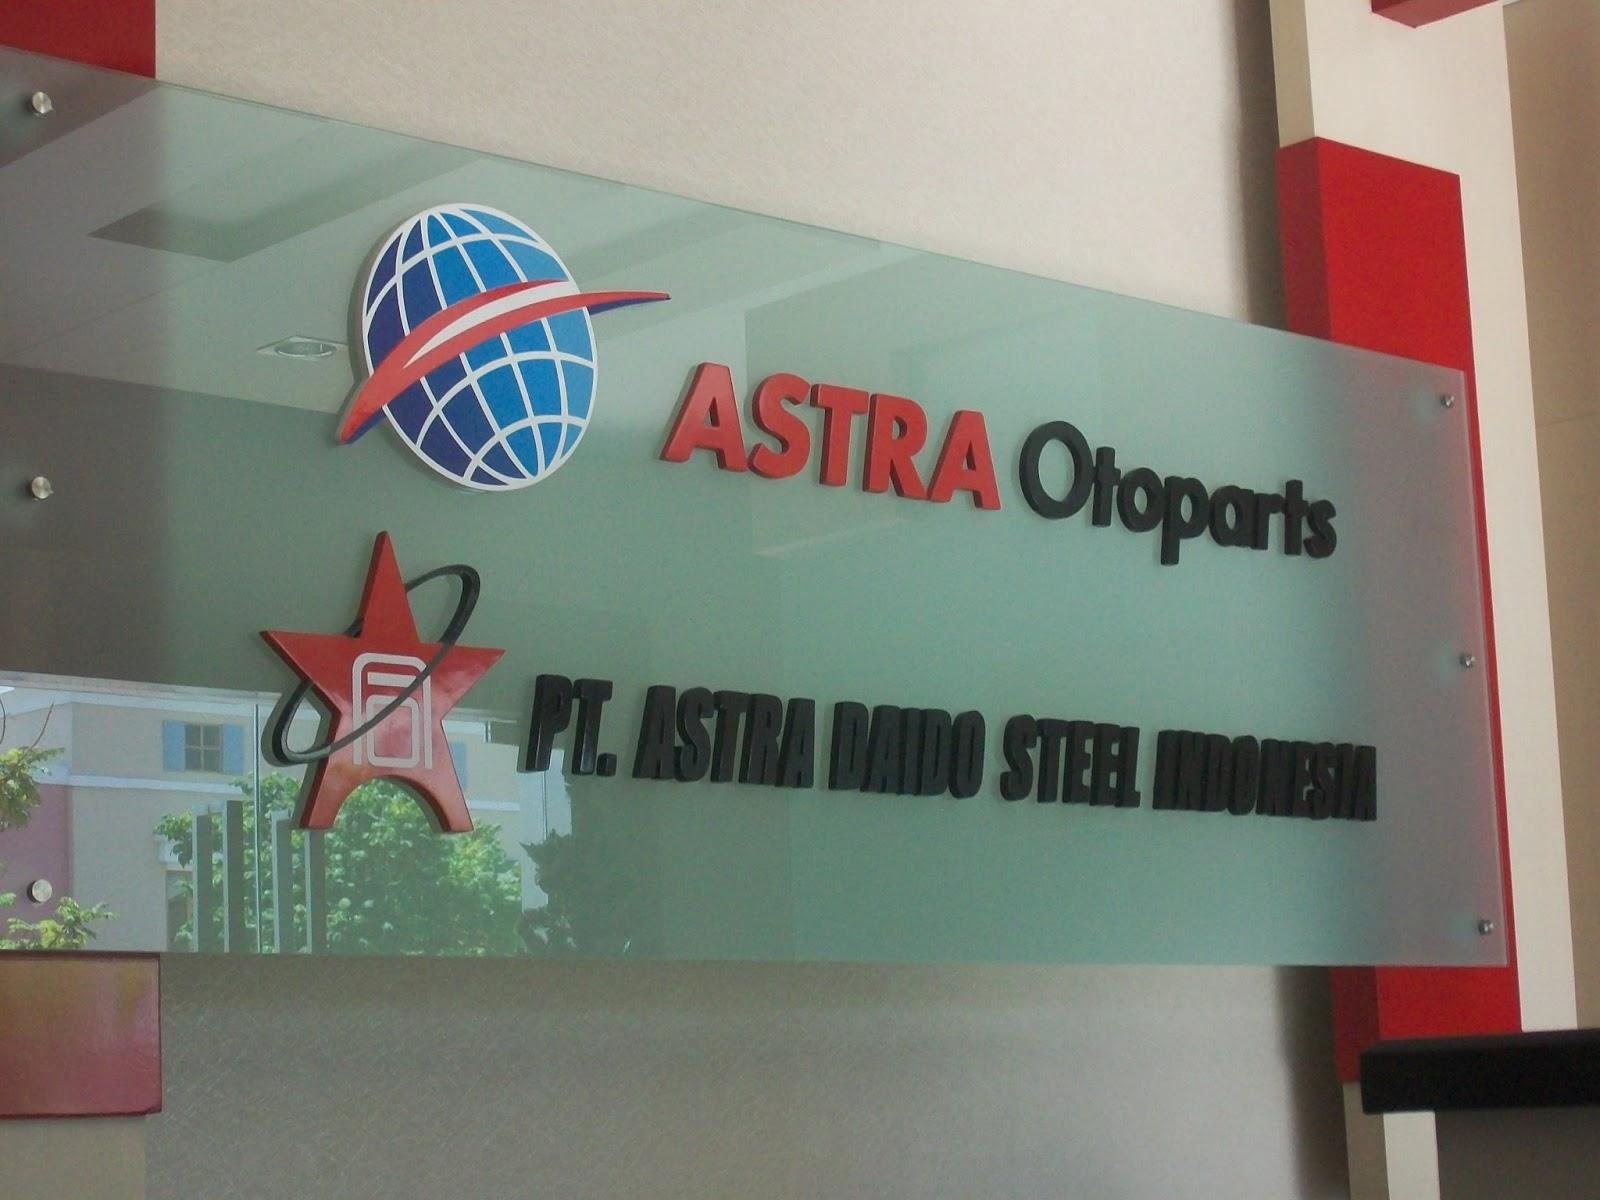 Lowongan Kerja Astra Group Info Terbaru PT. Astra Daido Steel Indonesia